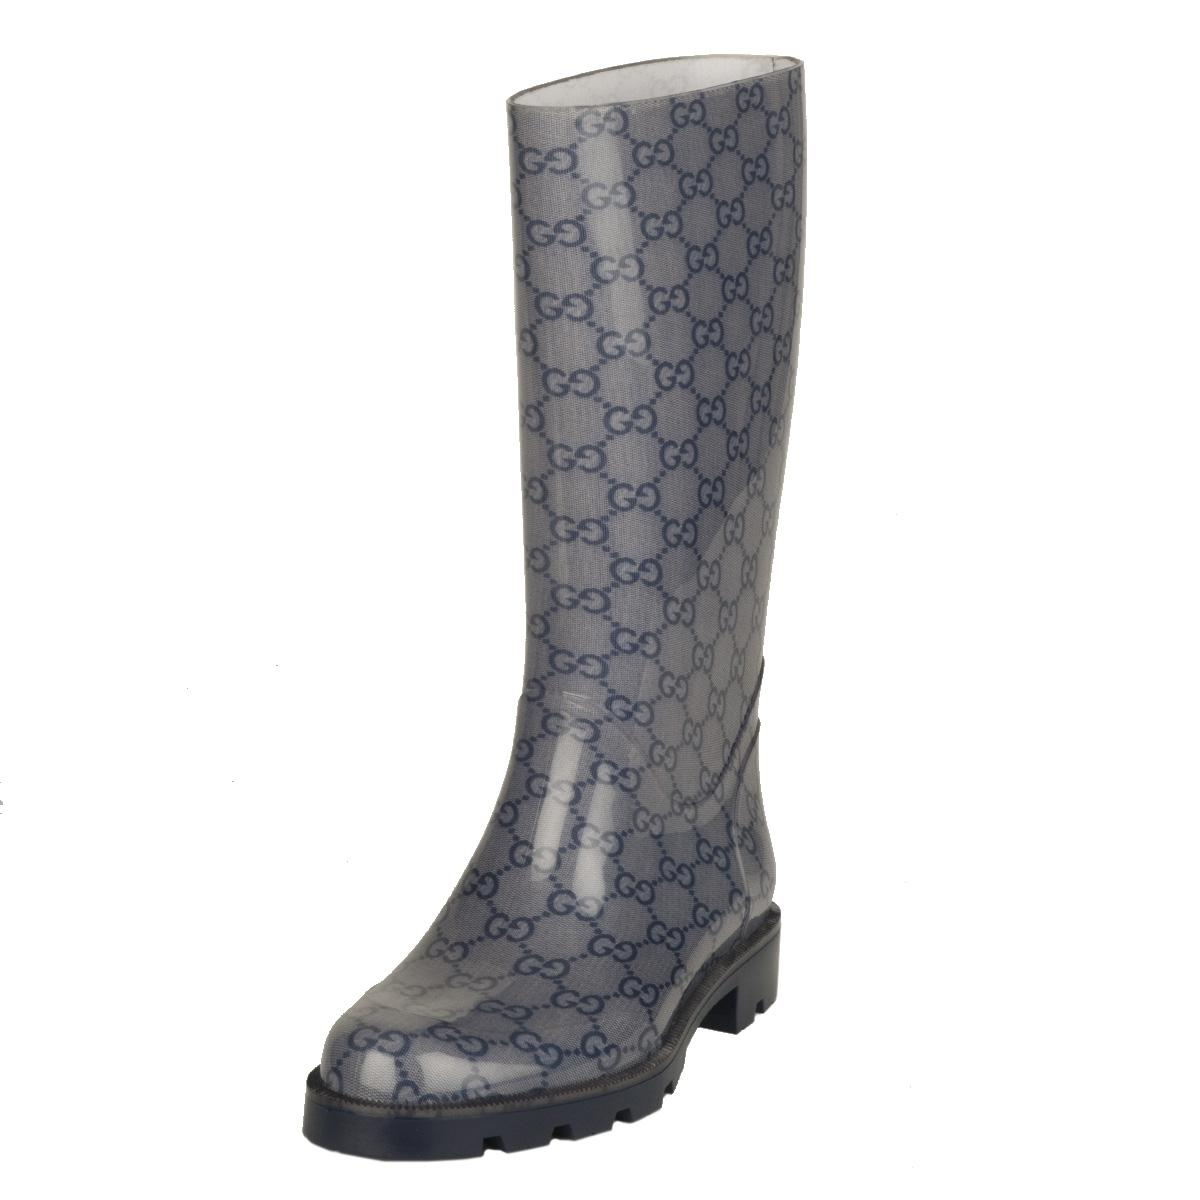 Gucci Women's 'Edimburg' Rubber Rainboots - Free Shipping Today ...